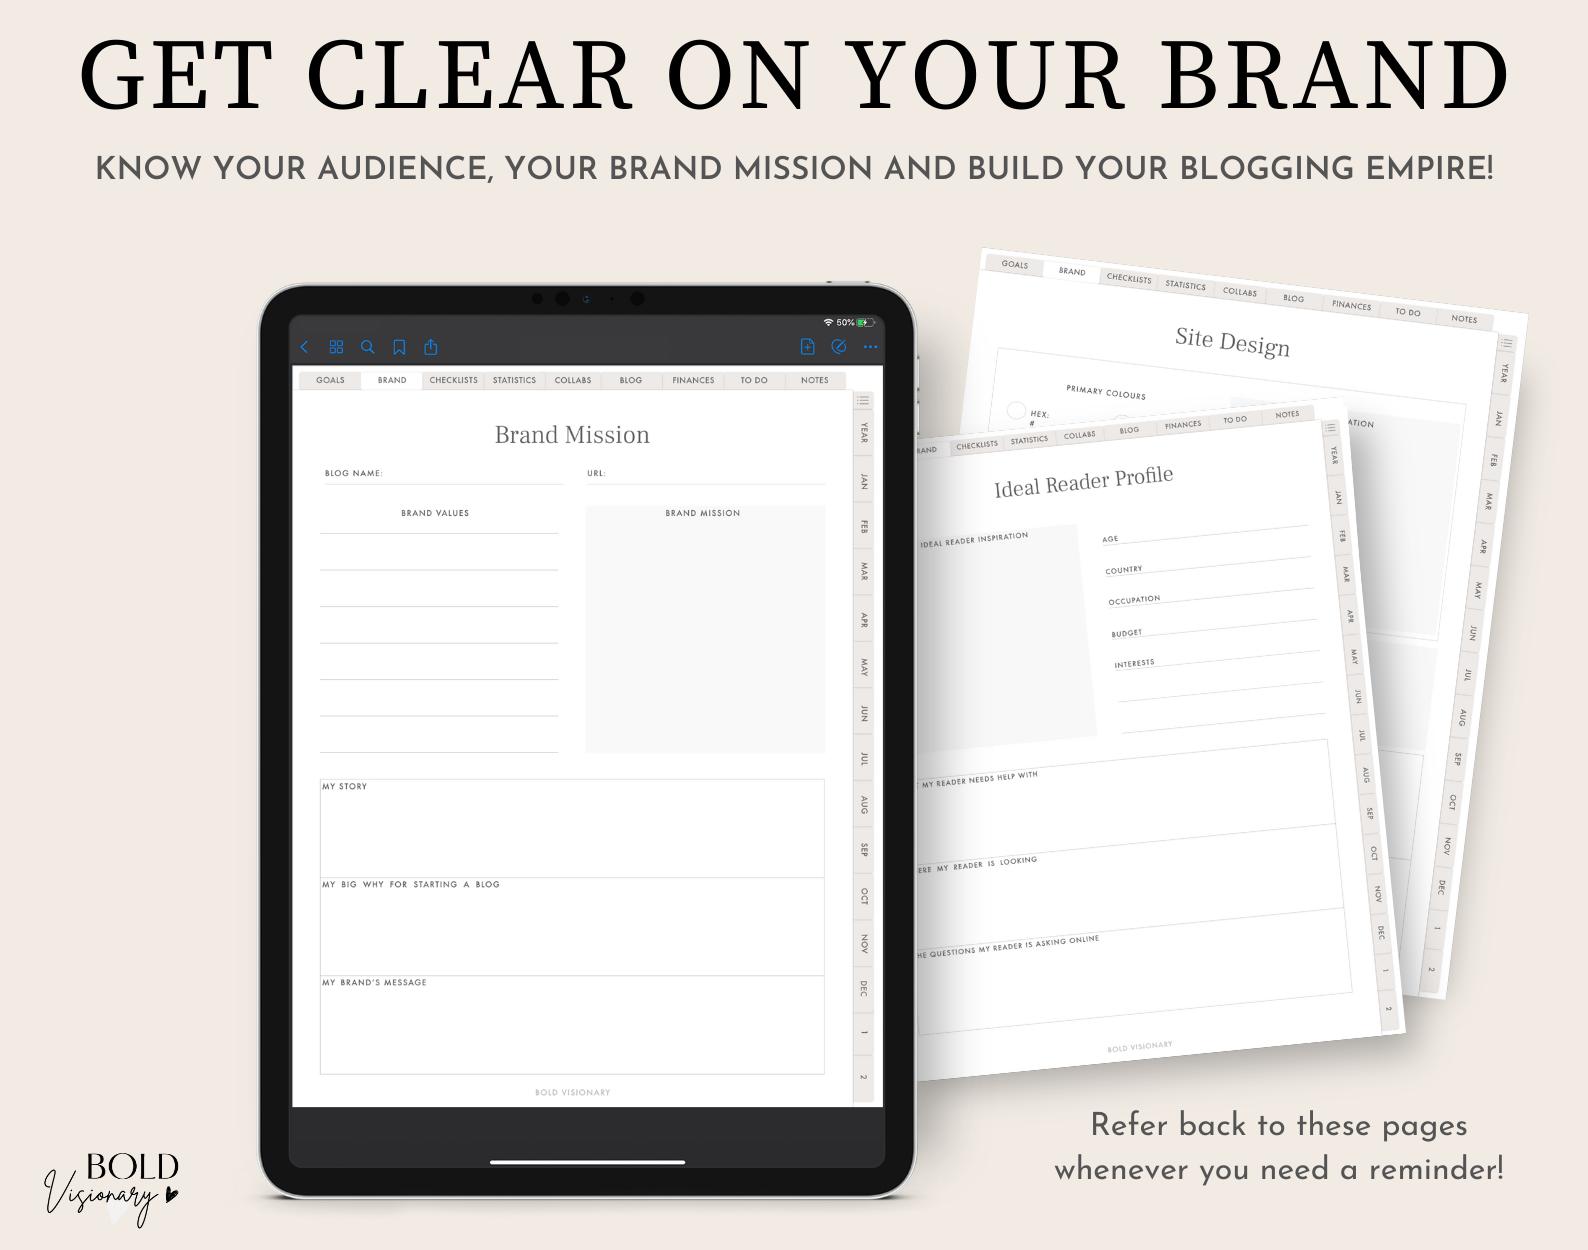 6Brand-Bold-Visionary-Digital-Blog-Planner